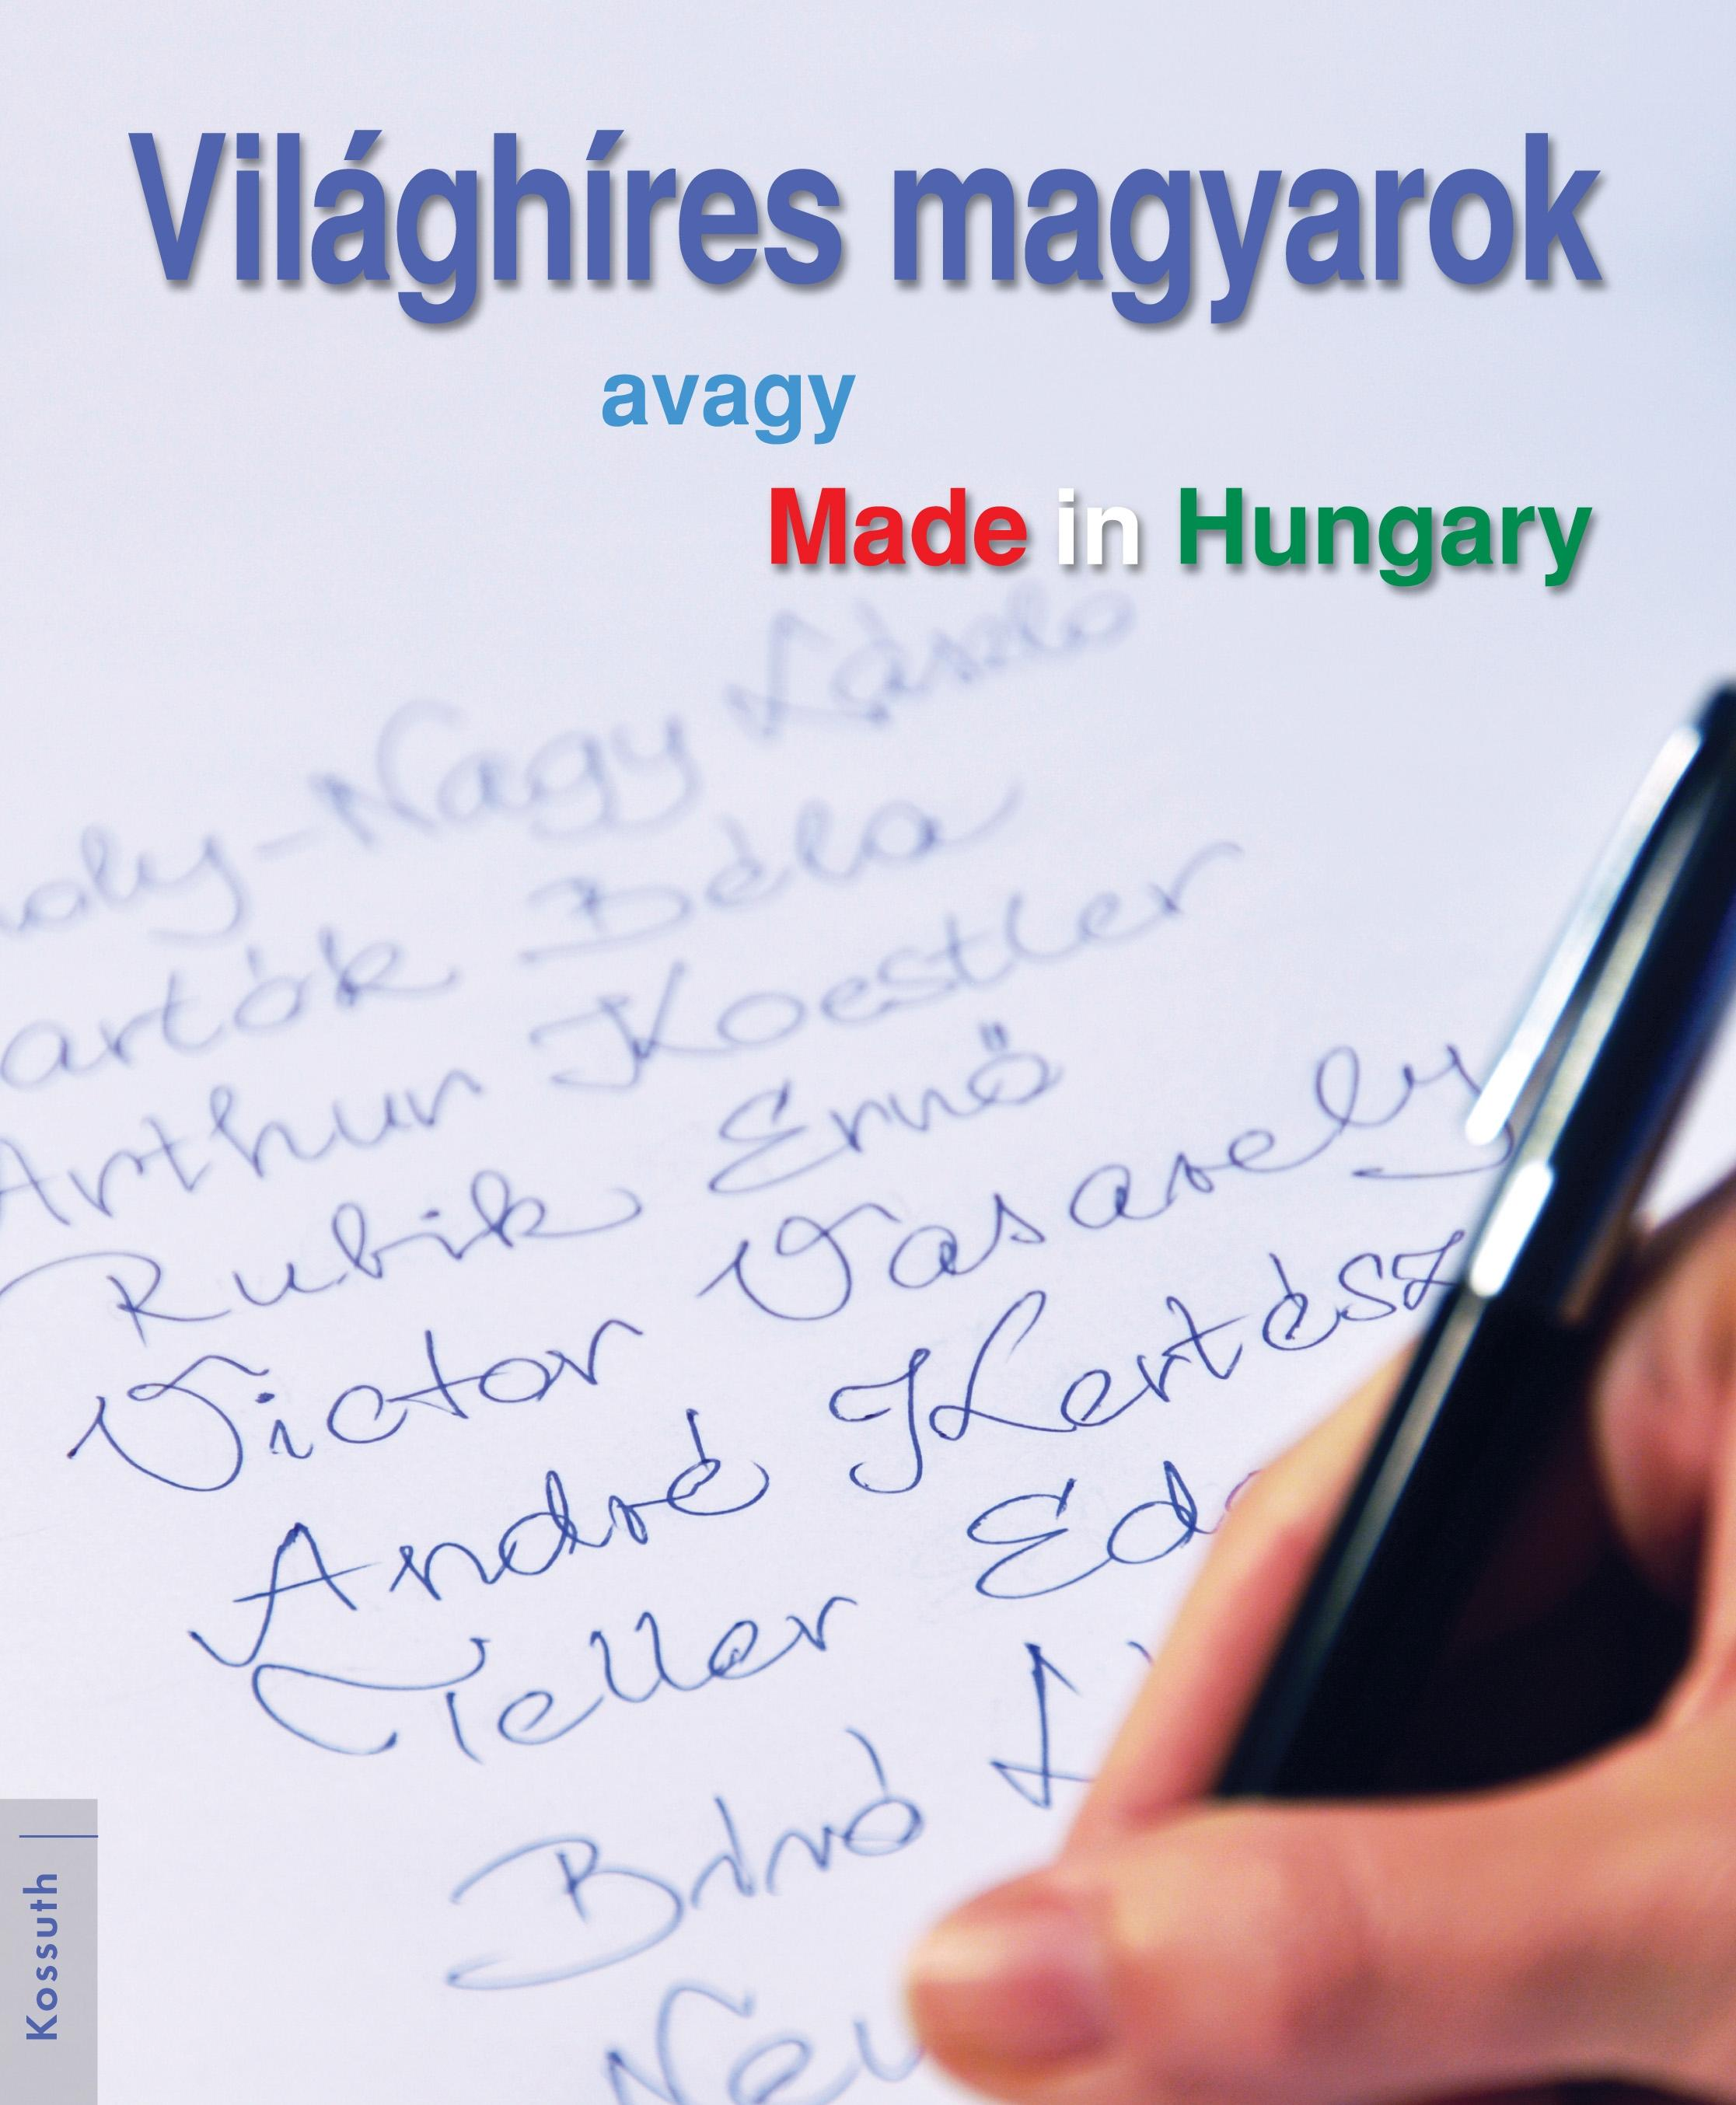 VILÁGHÍRES MAGYAROK - AVAGY MADE IN HUNGARY